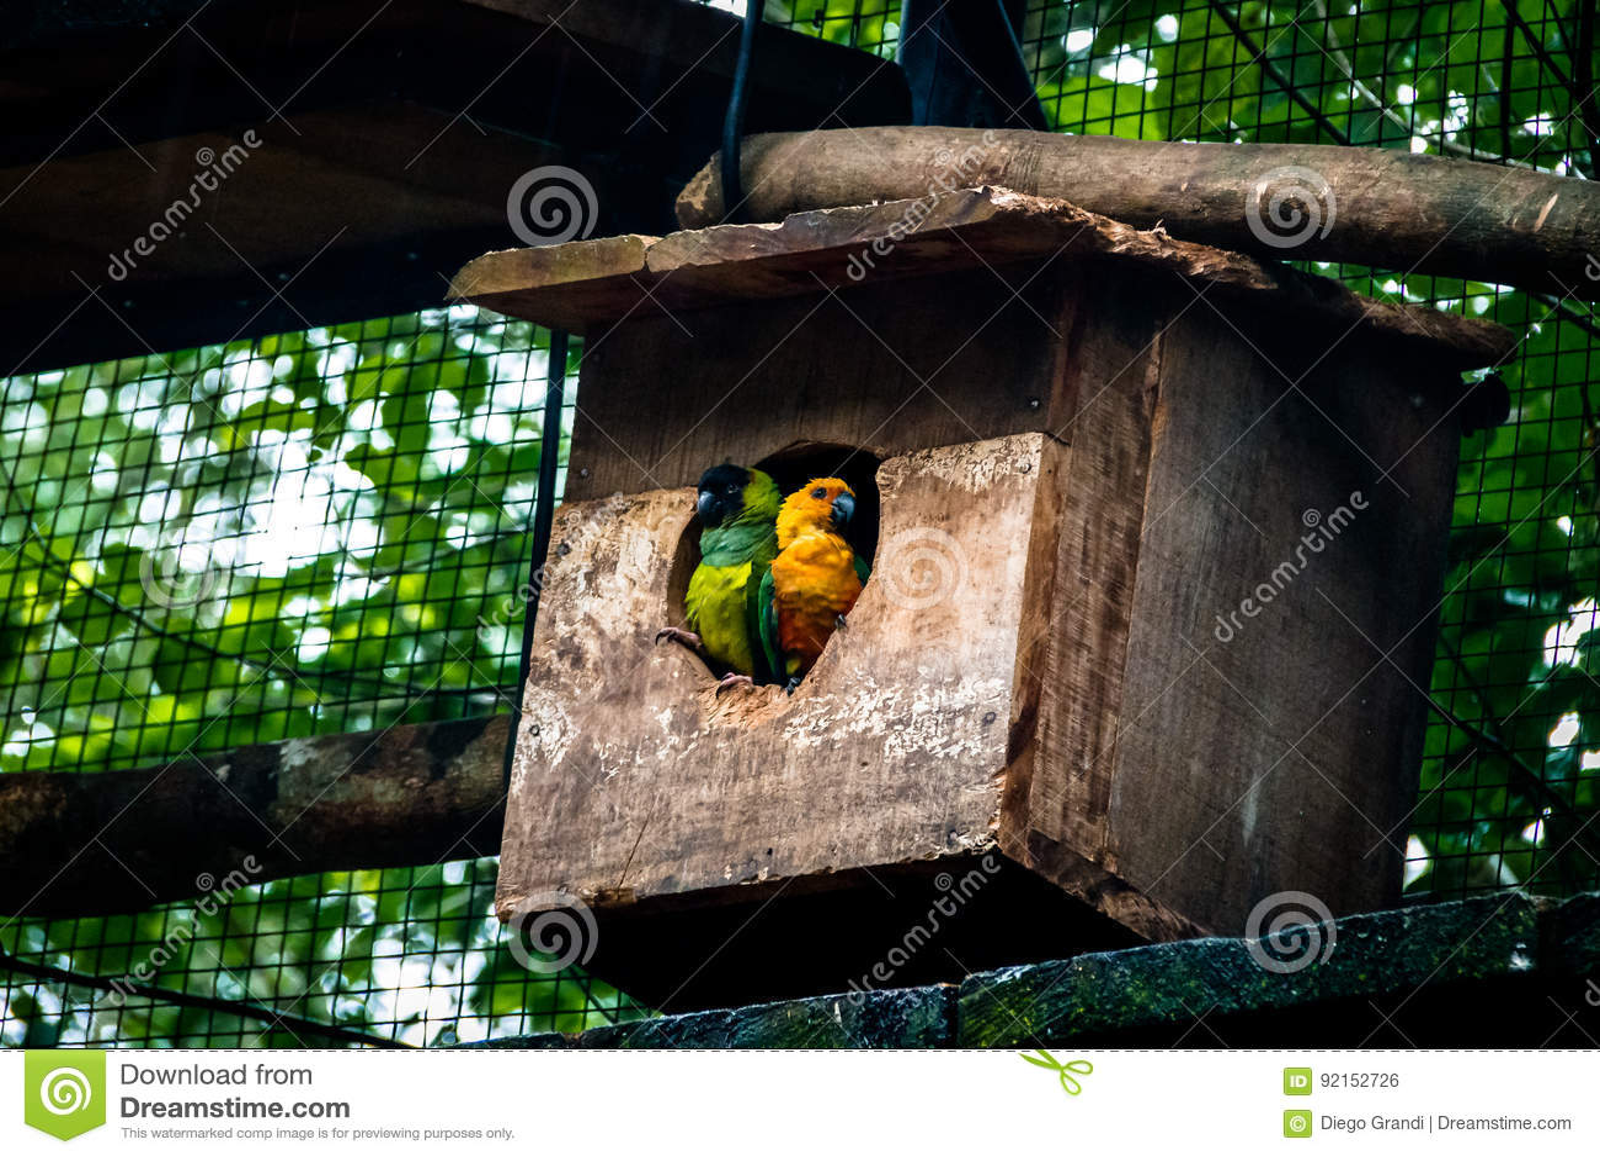 Sun Parakeet and Nanday Parakeet Couple at Parque das Aves - Foz do Iguacu, Parana, Brazil